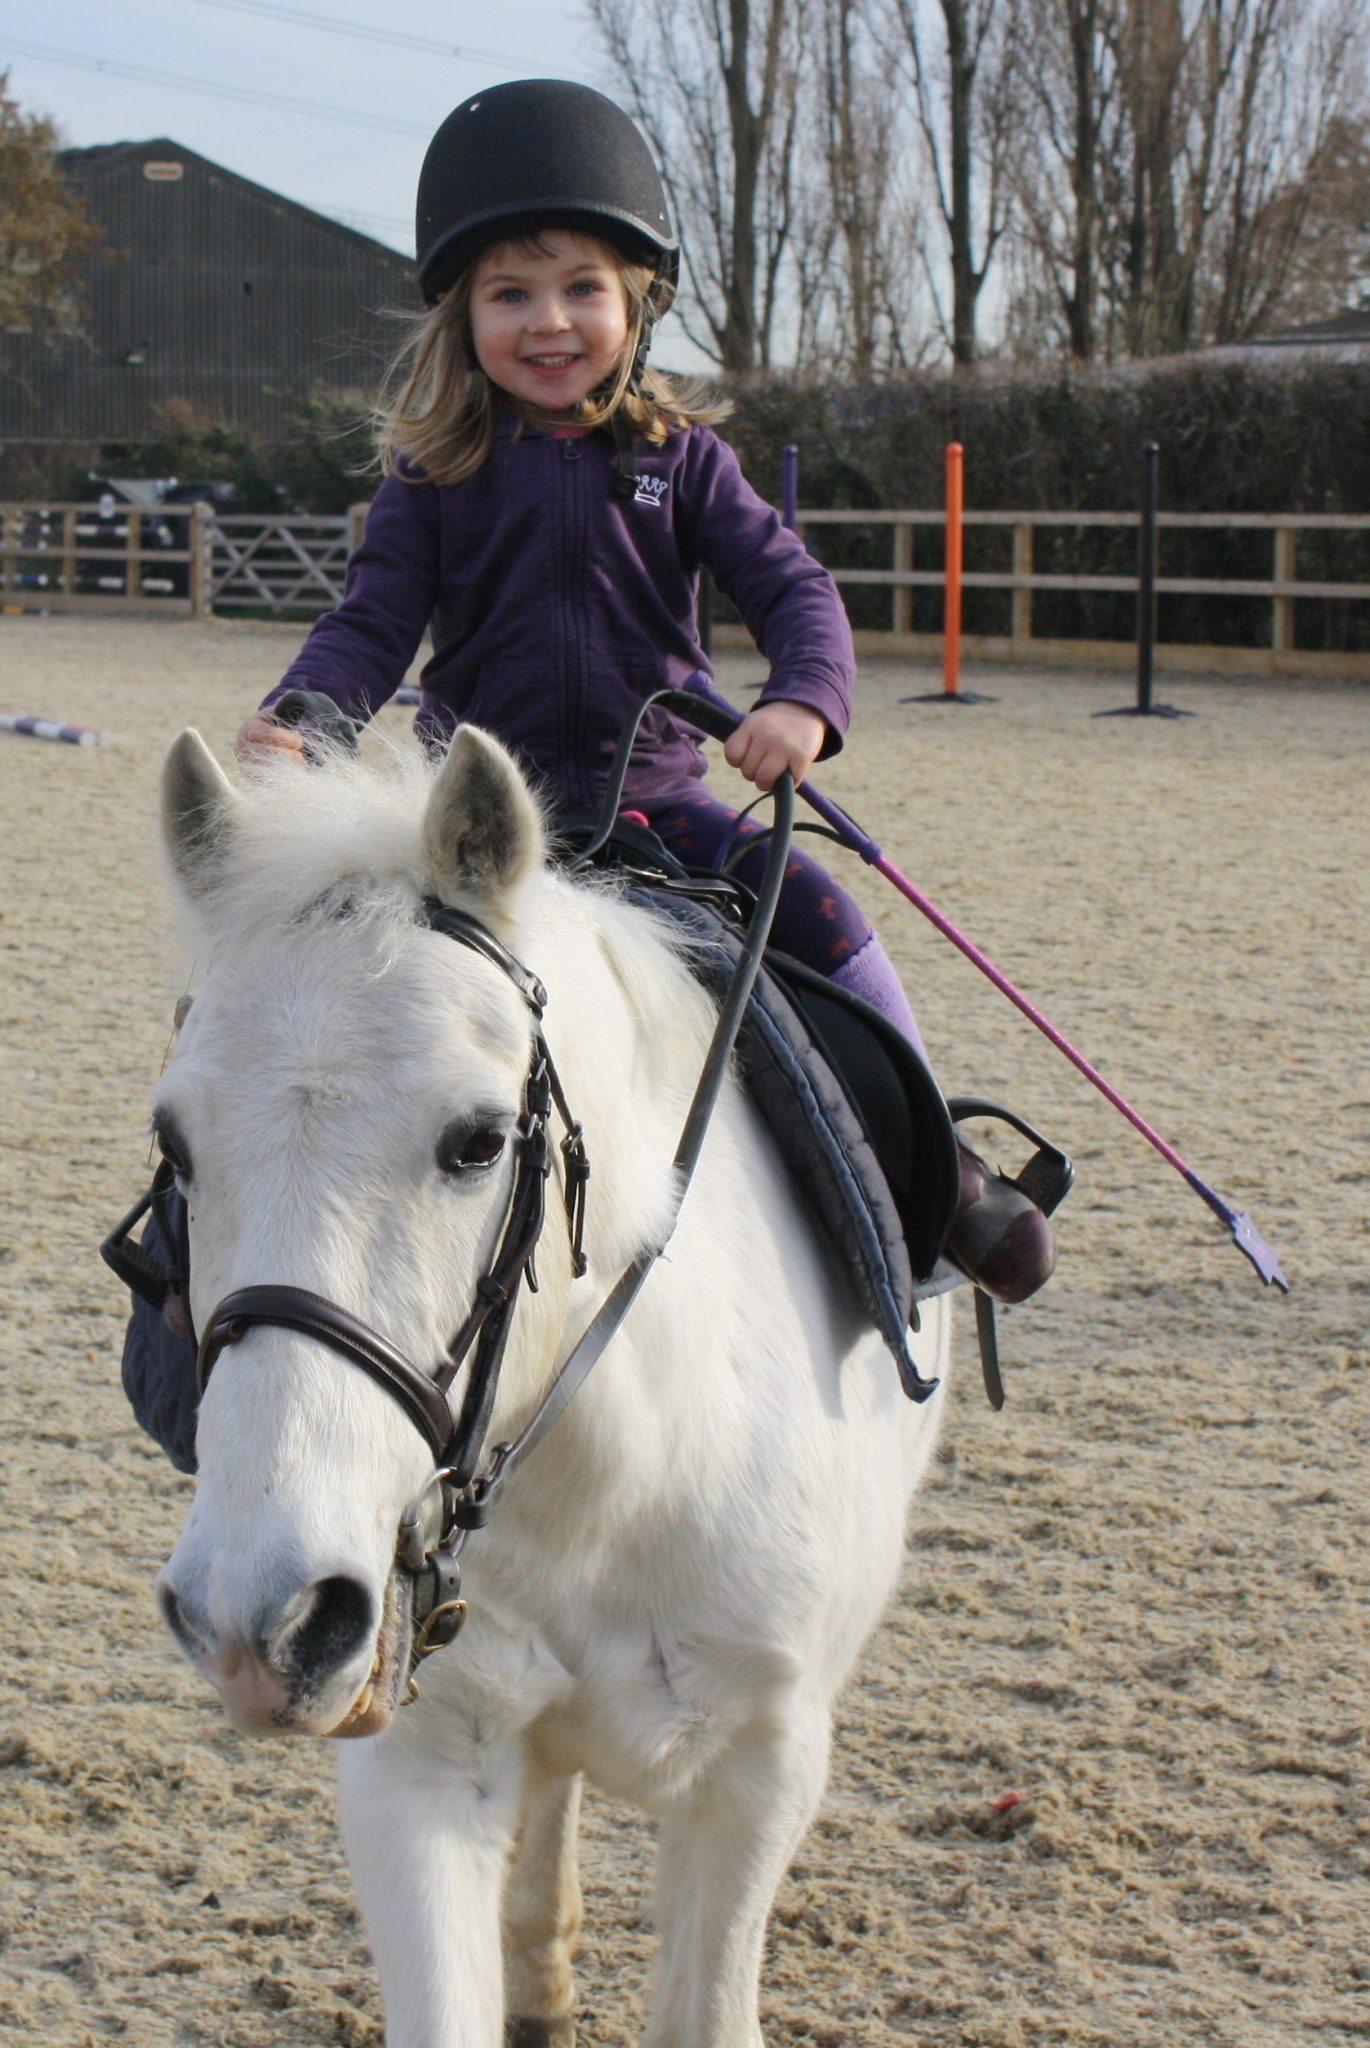 Runningwell Equestrian centre